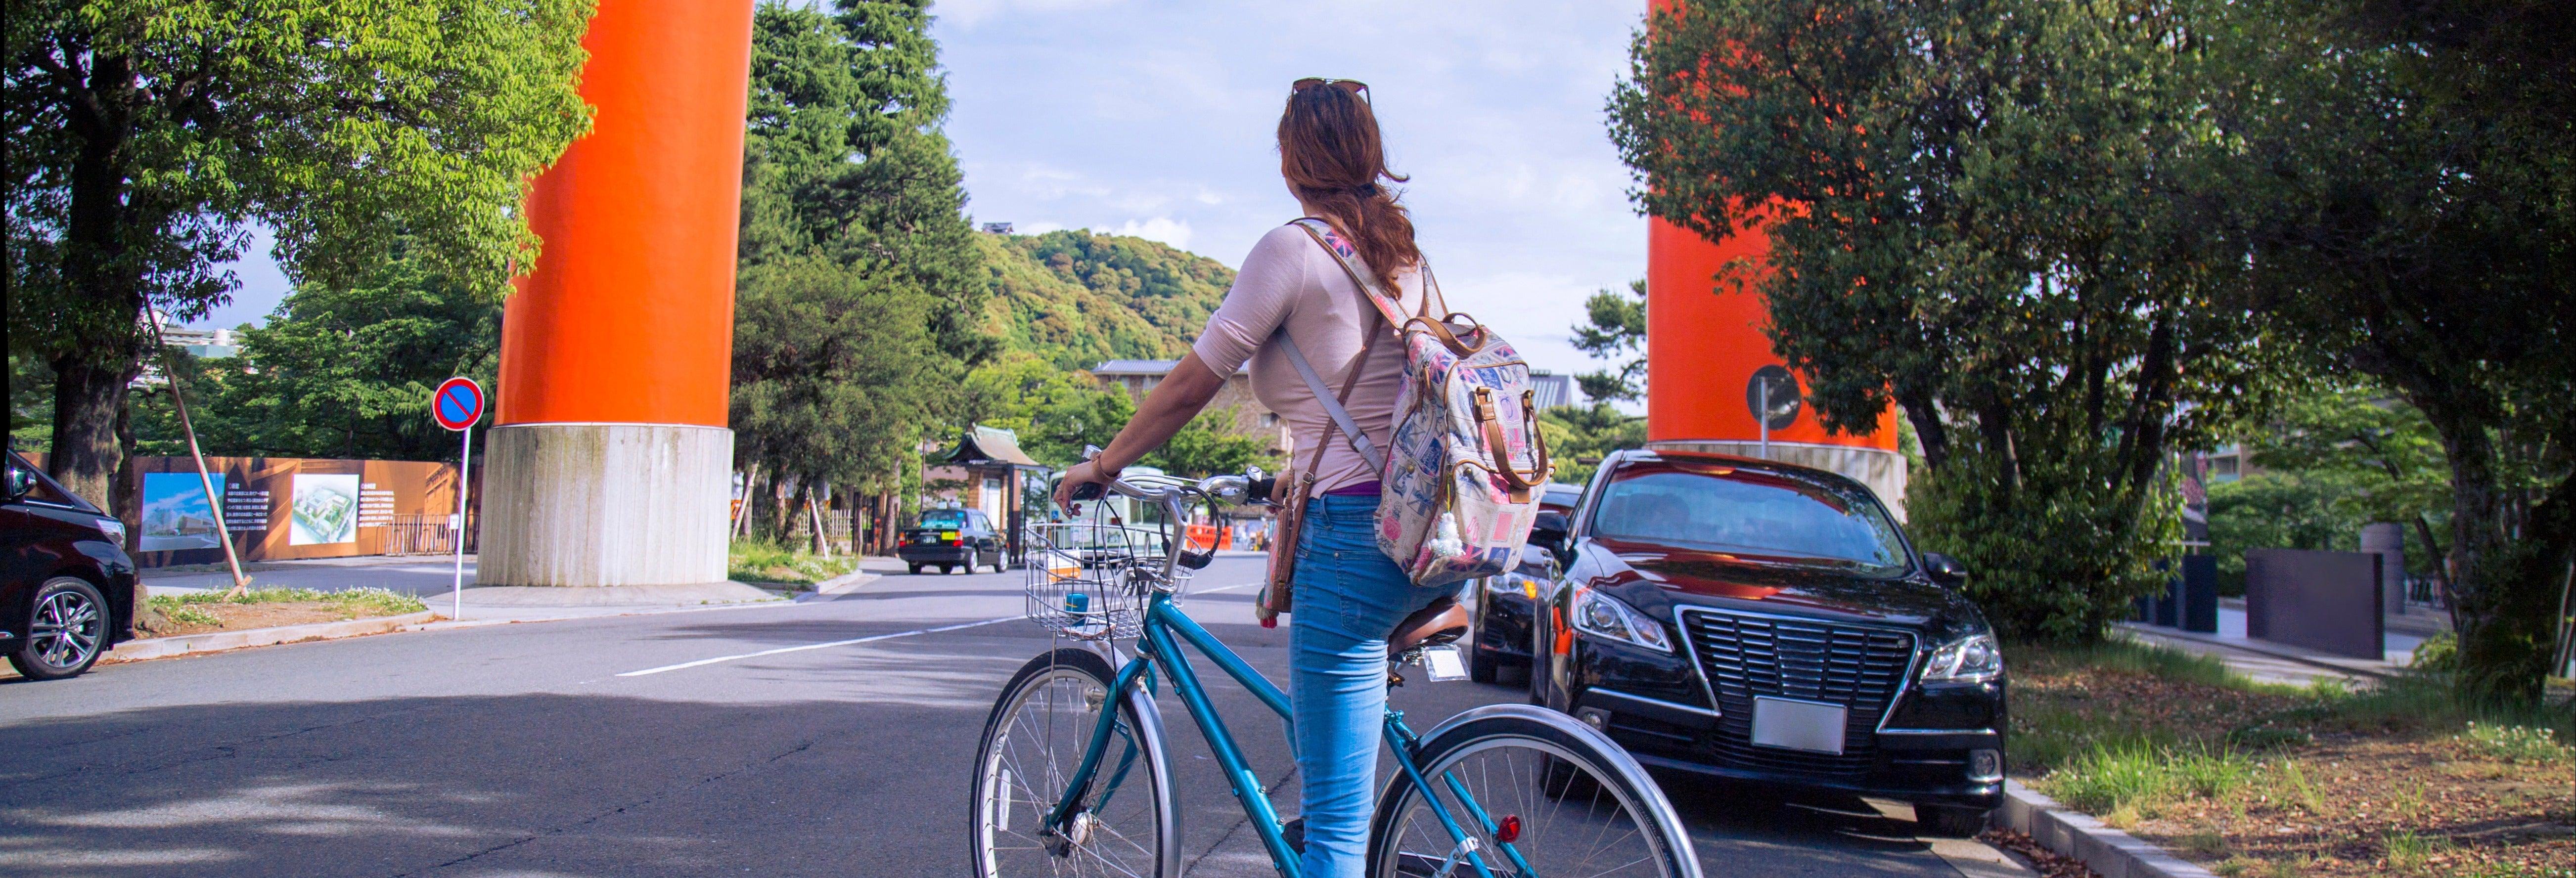 Tour en bicicleta por Kioto